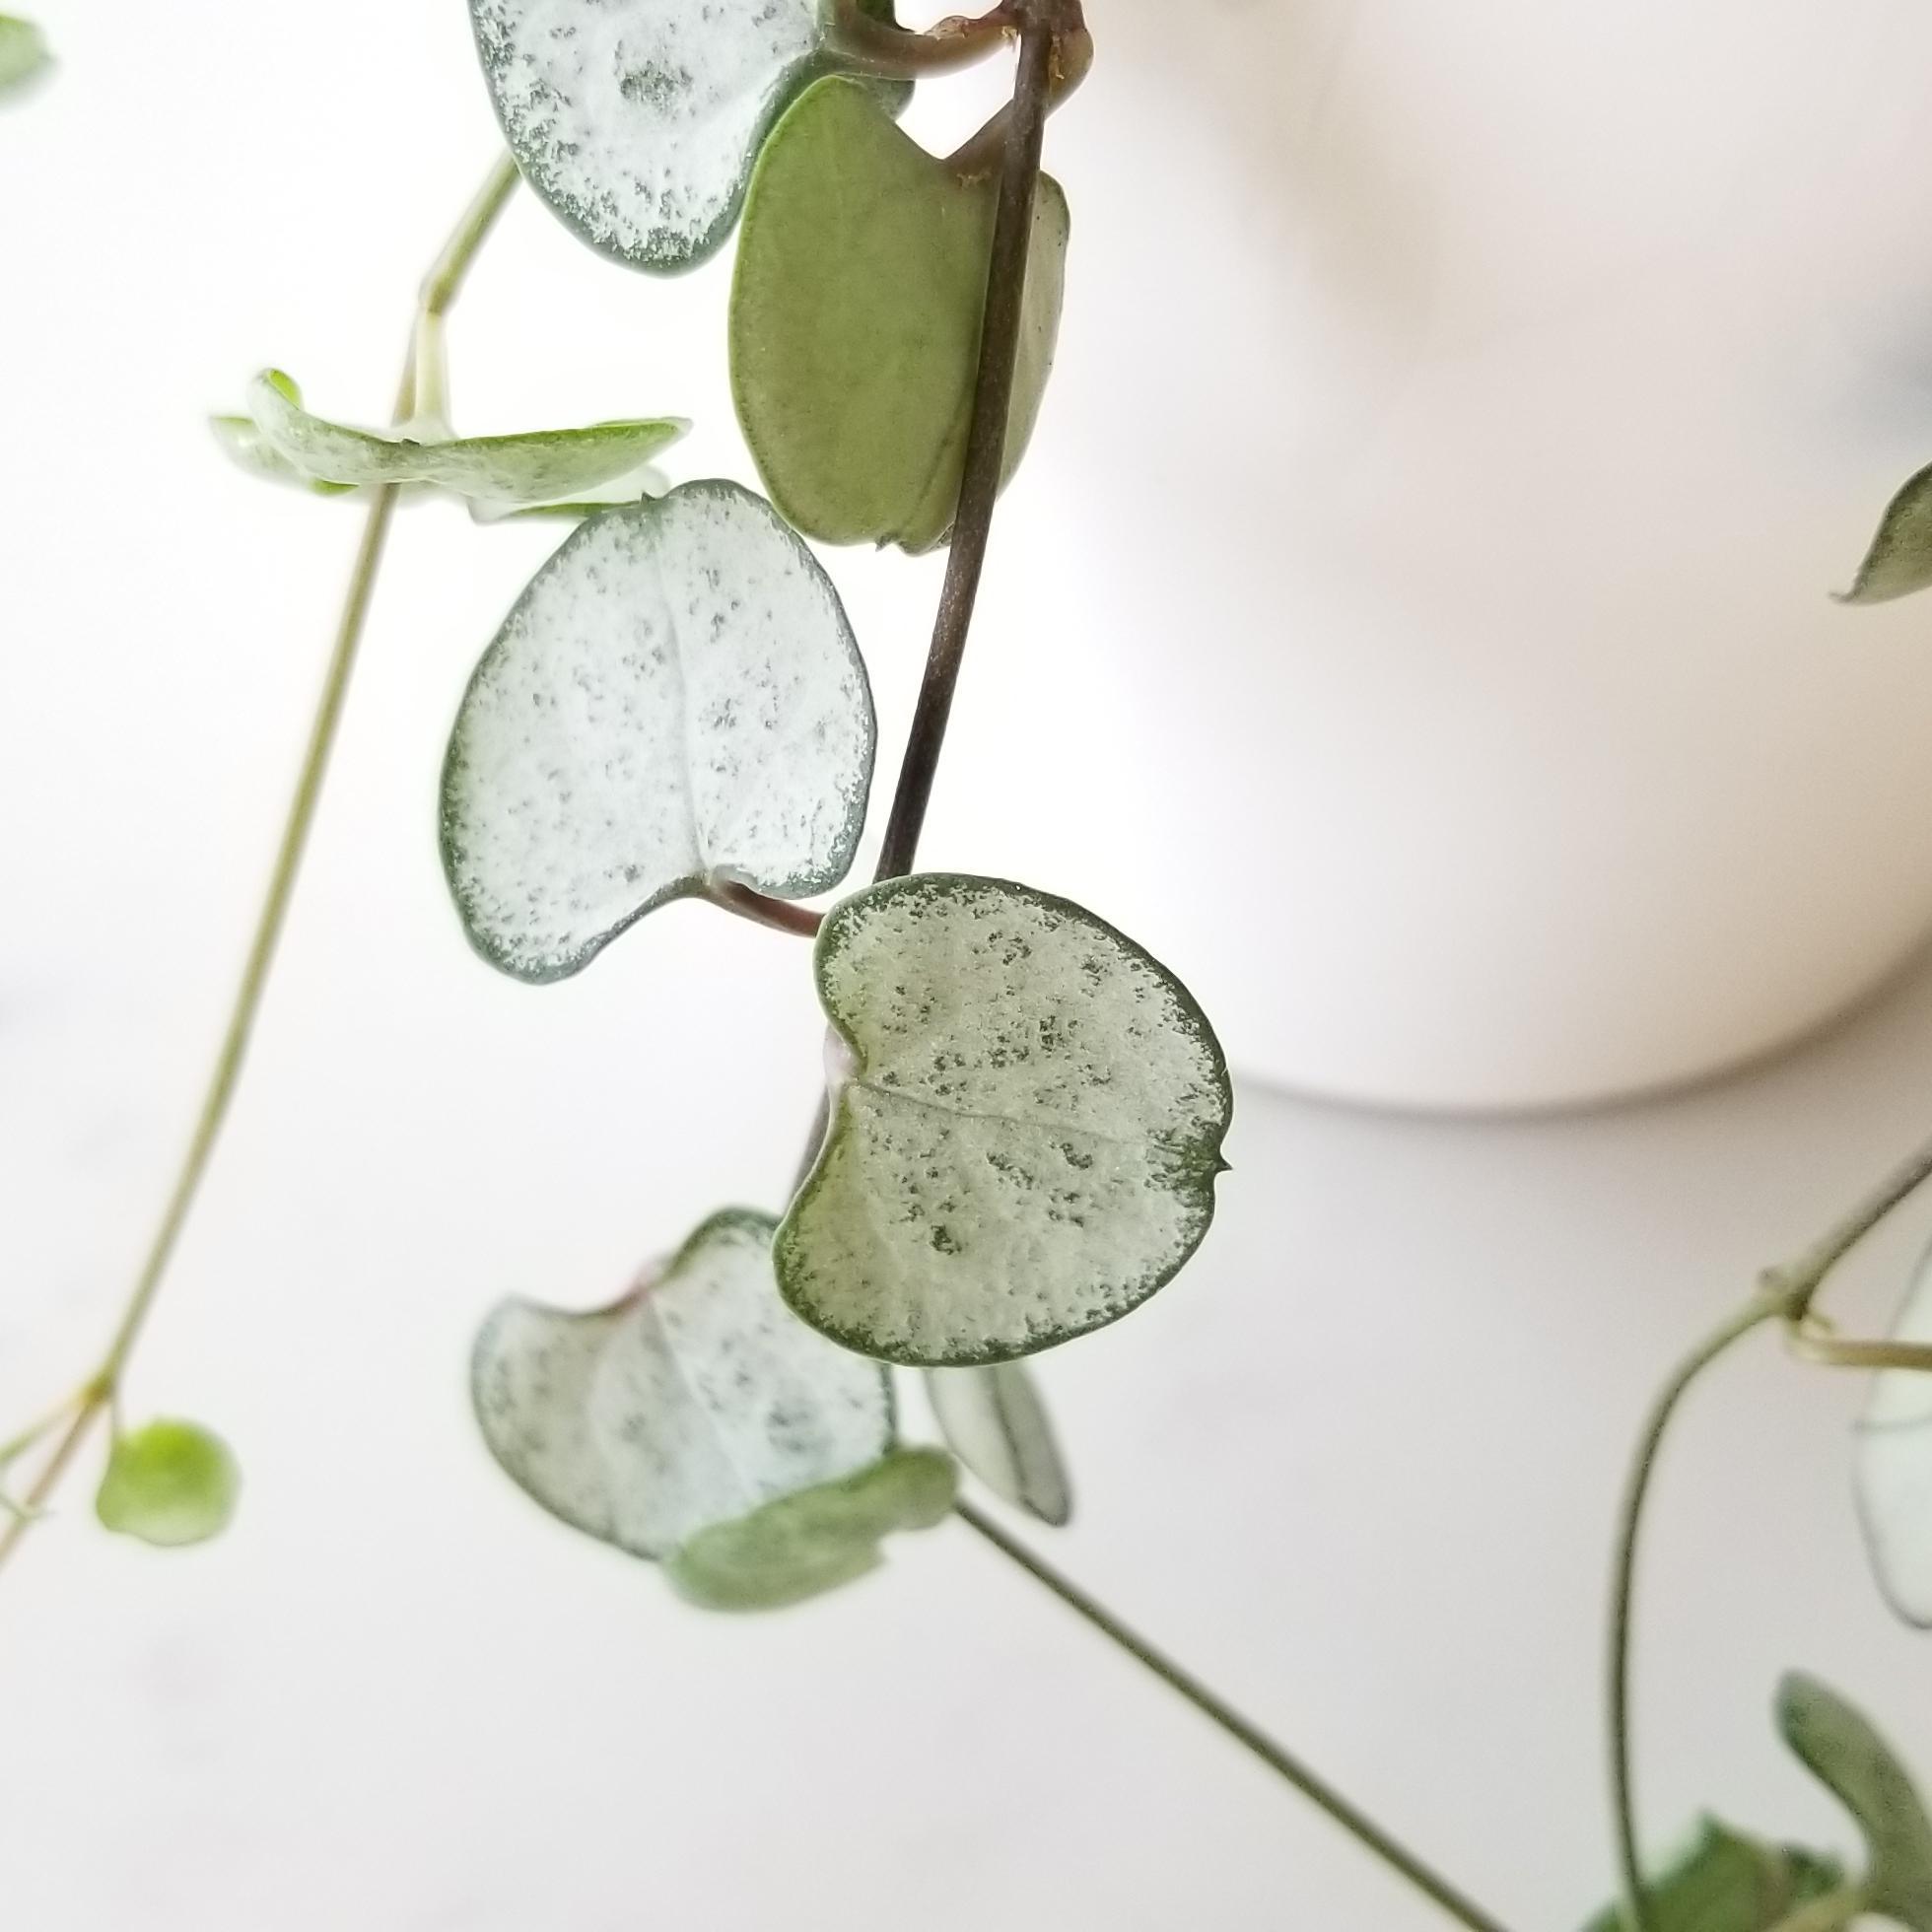 Indoor plants houseplants green plants for indoors interiorplants Plant shop GTA Mississauga Toronto Etobicoke Brampton Burlington Oakville Hamilton Ceropegia woodii String of Hearts Silver Glory